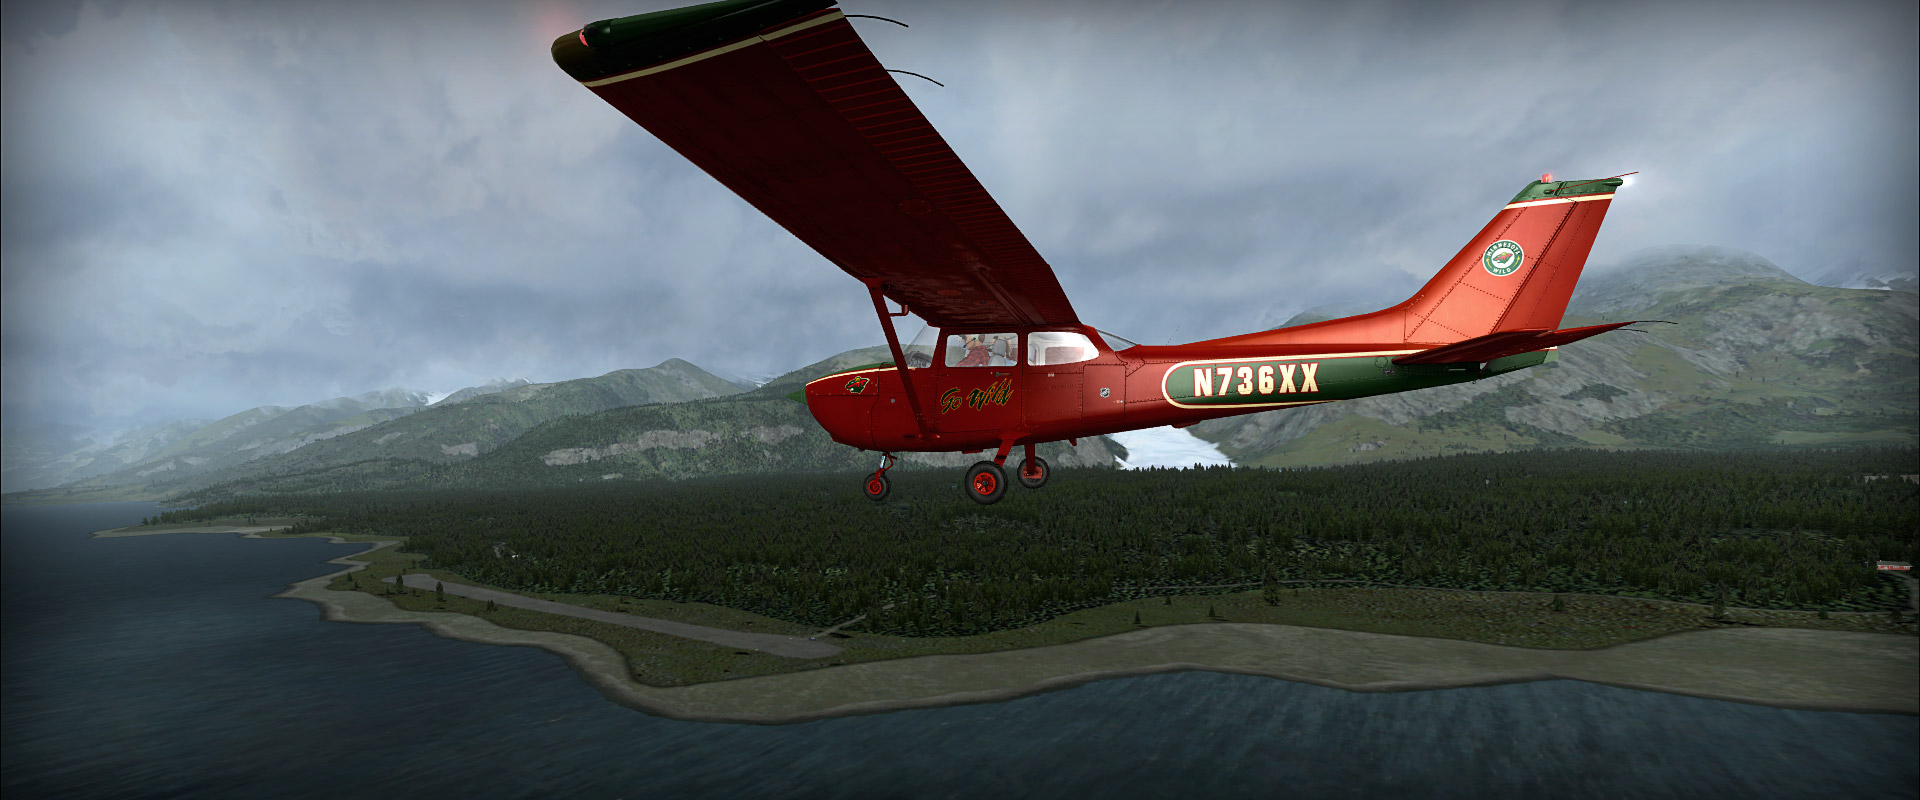 A2A – AccuSim GA aircraft – megareview (C172, C182, PA24) – #1 • C